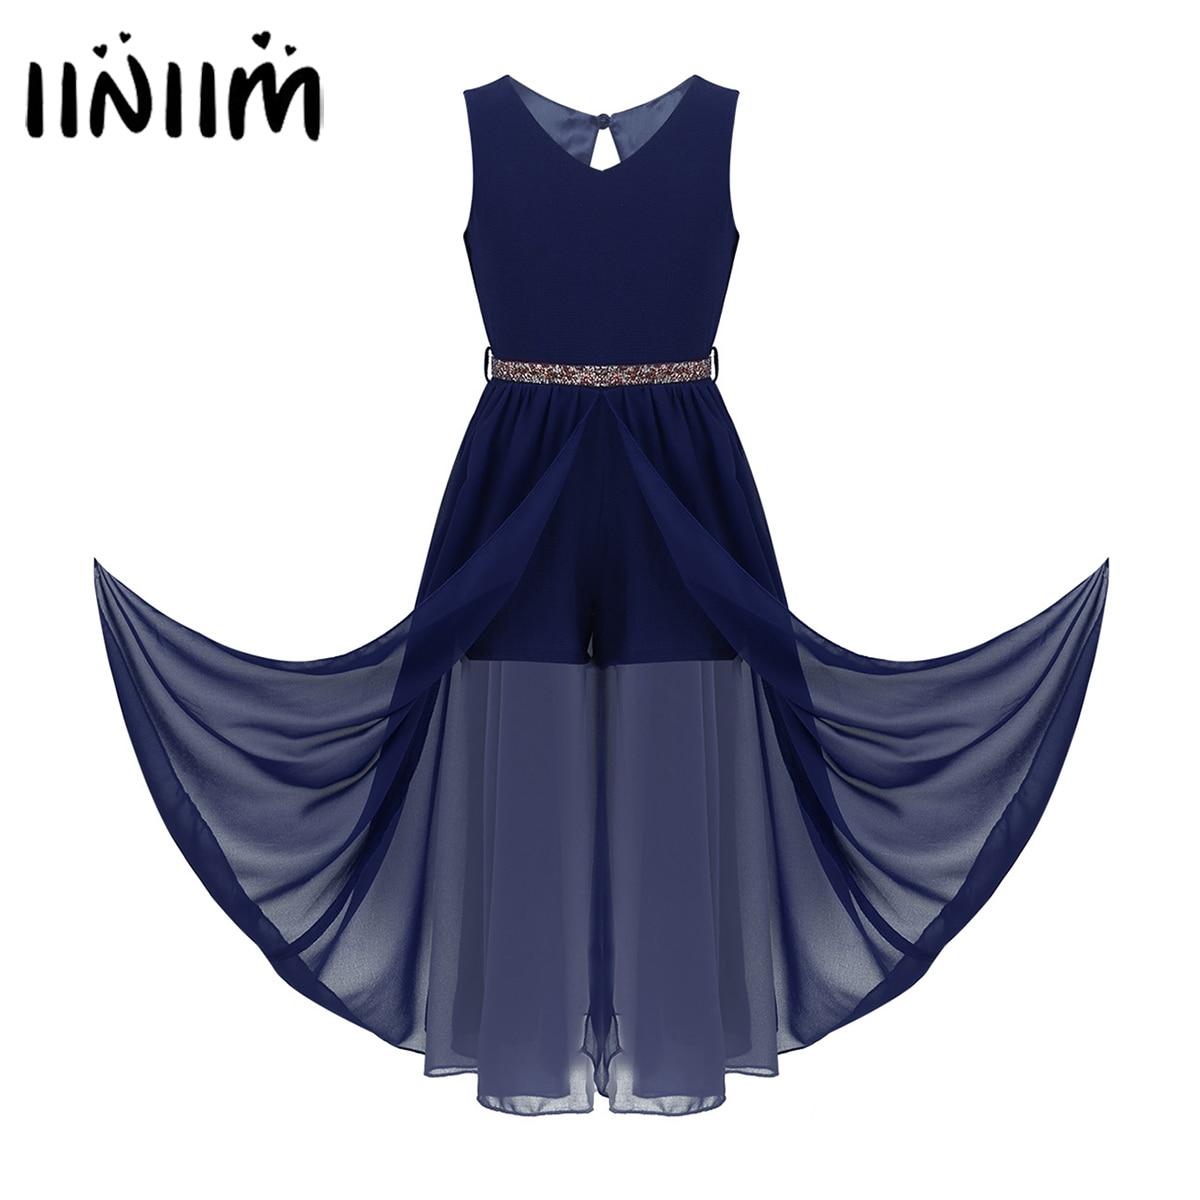 Kids Girls Ballroom Dance Competition Dress Short Jumpsuit Romper Maxi Dress With Rhinestone Belt For Pageant School Dancewear